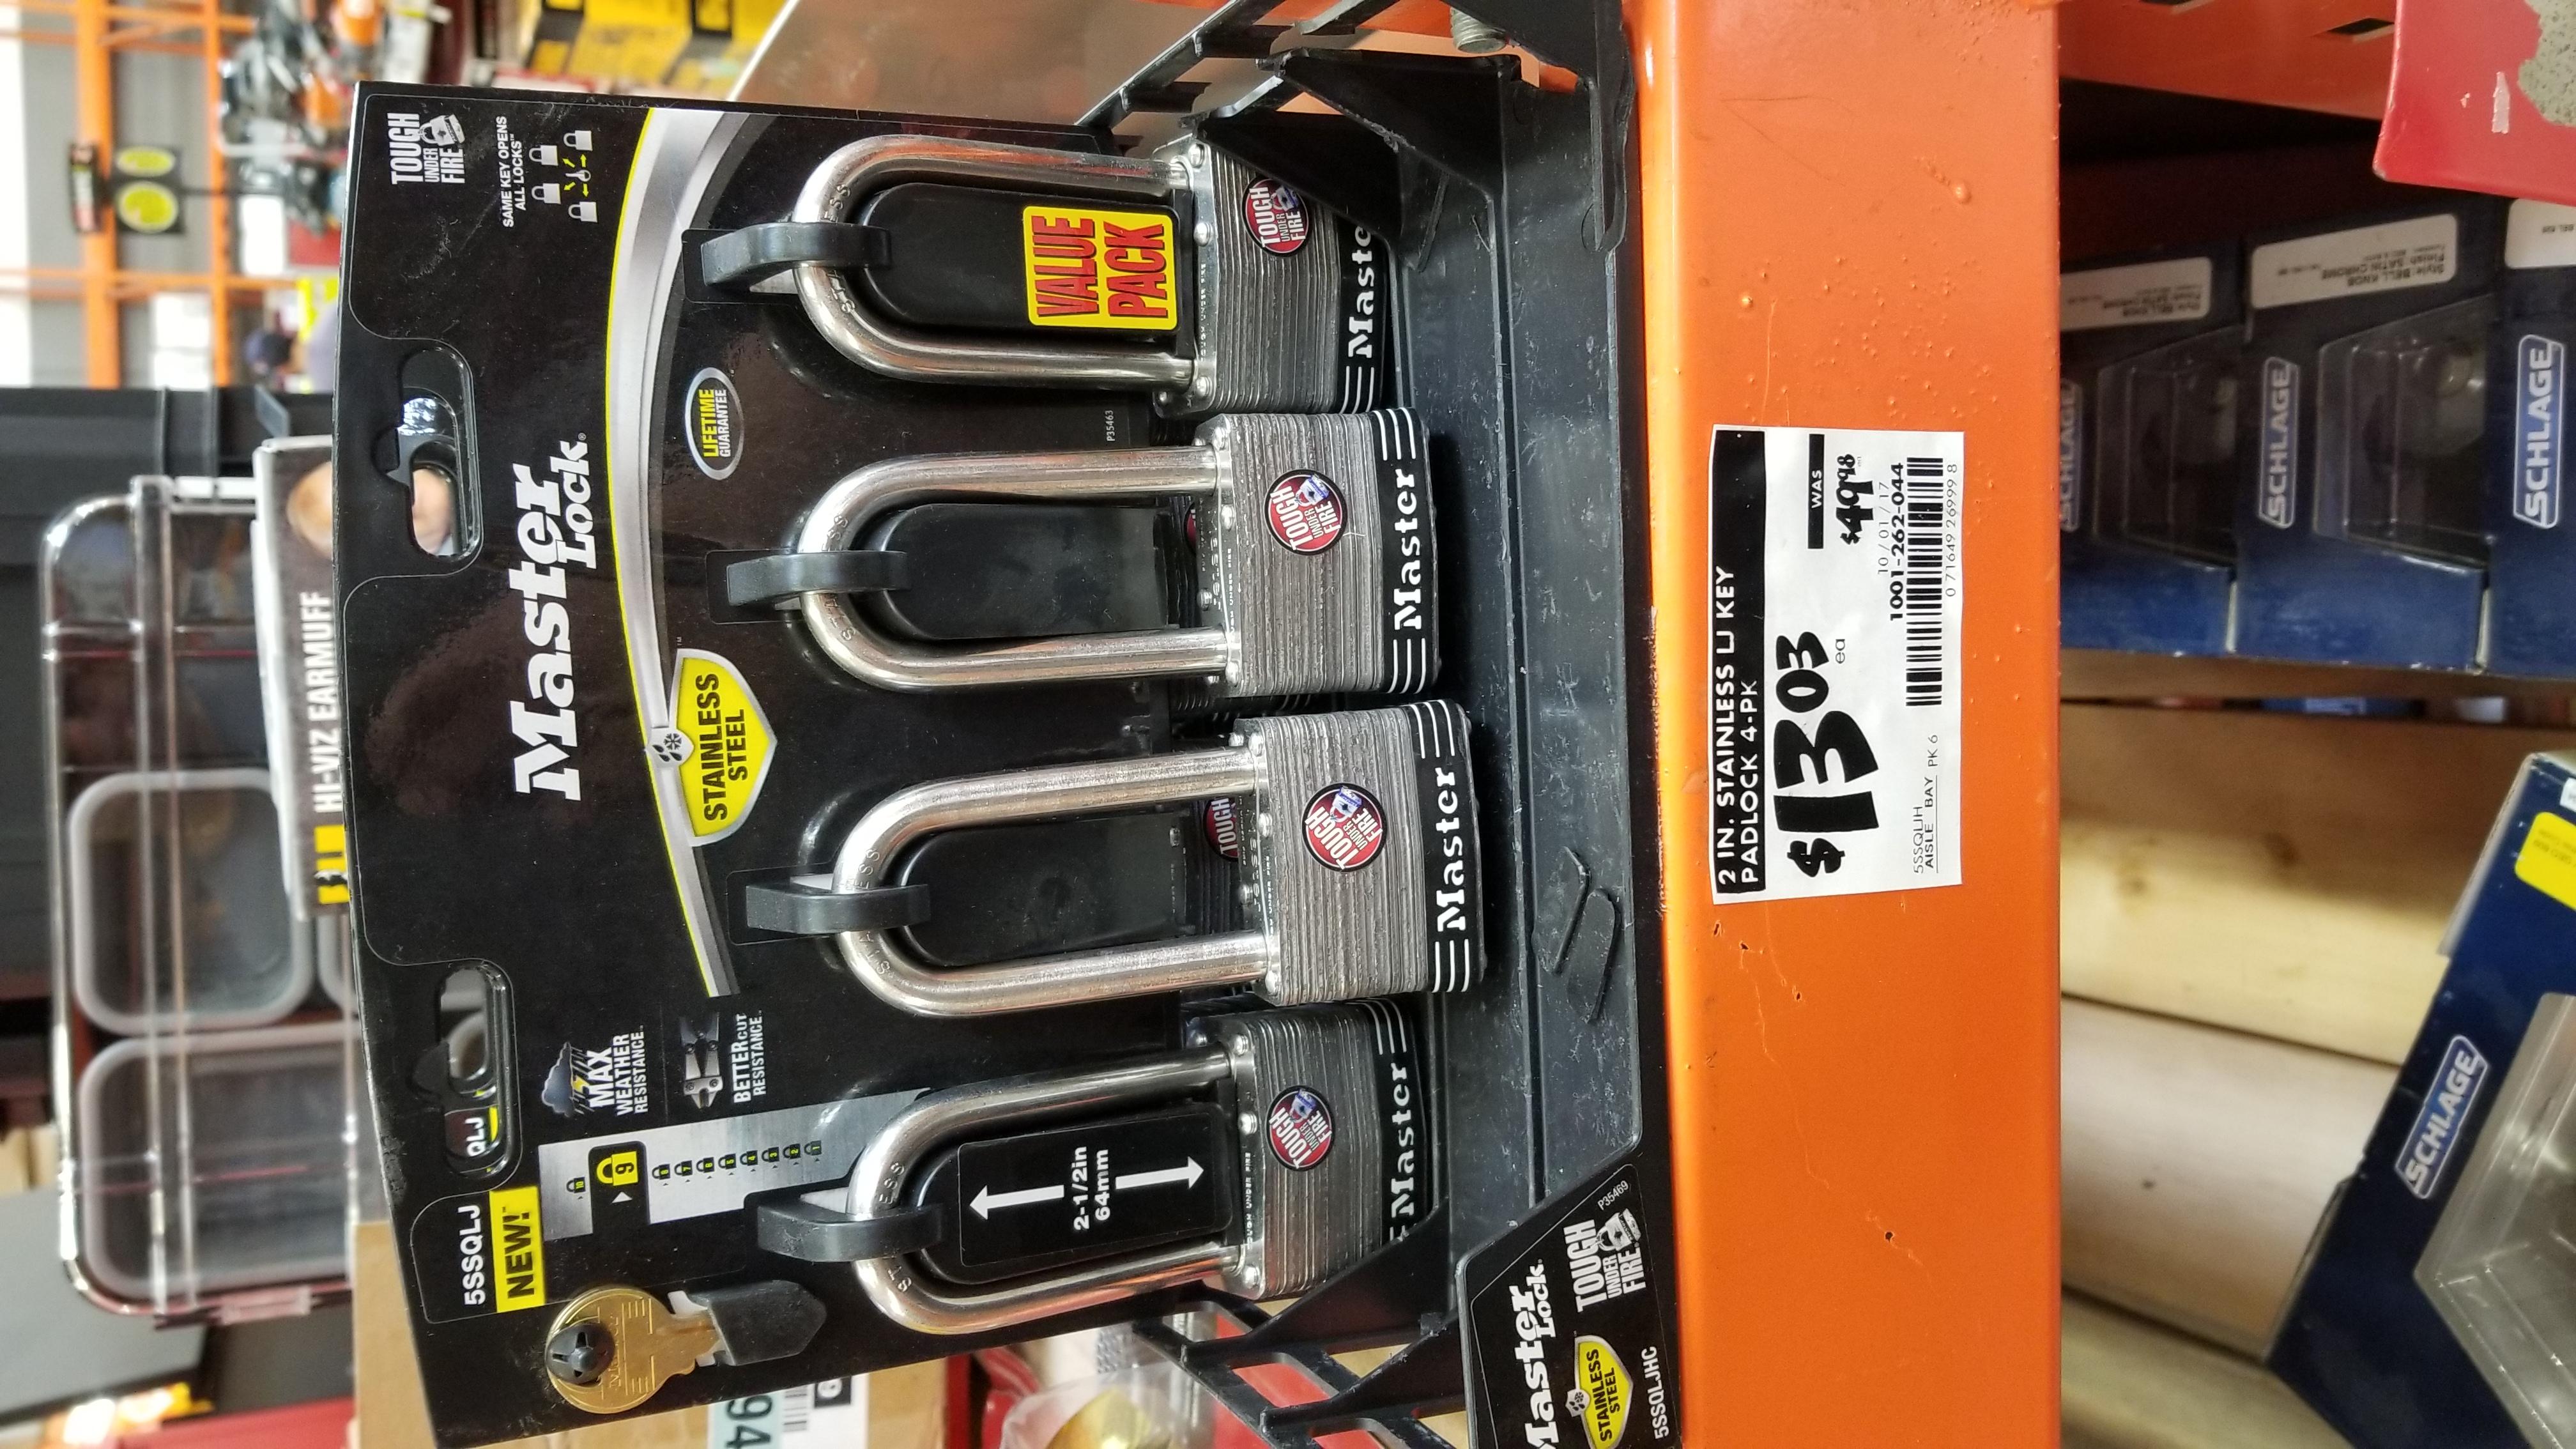 Master Lock Padlock, SS 2 in. Wide, 5SSQLJ (Pack of 4-Keyed Alike) Clearance $13.03 (Reg. 49.98) Home Depot B&M YMMV